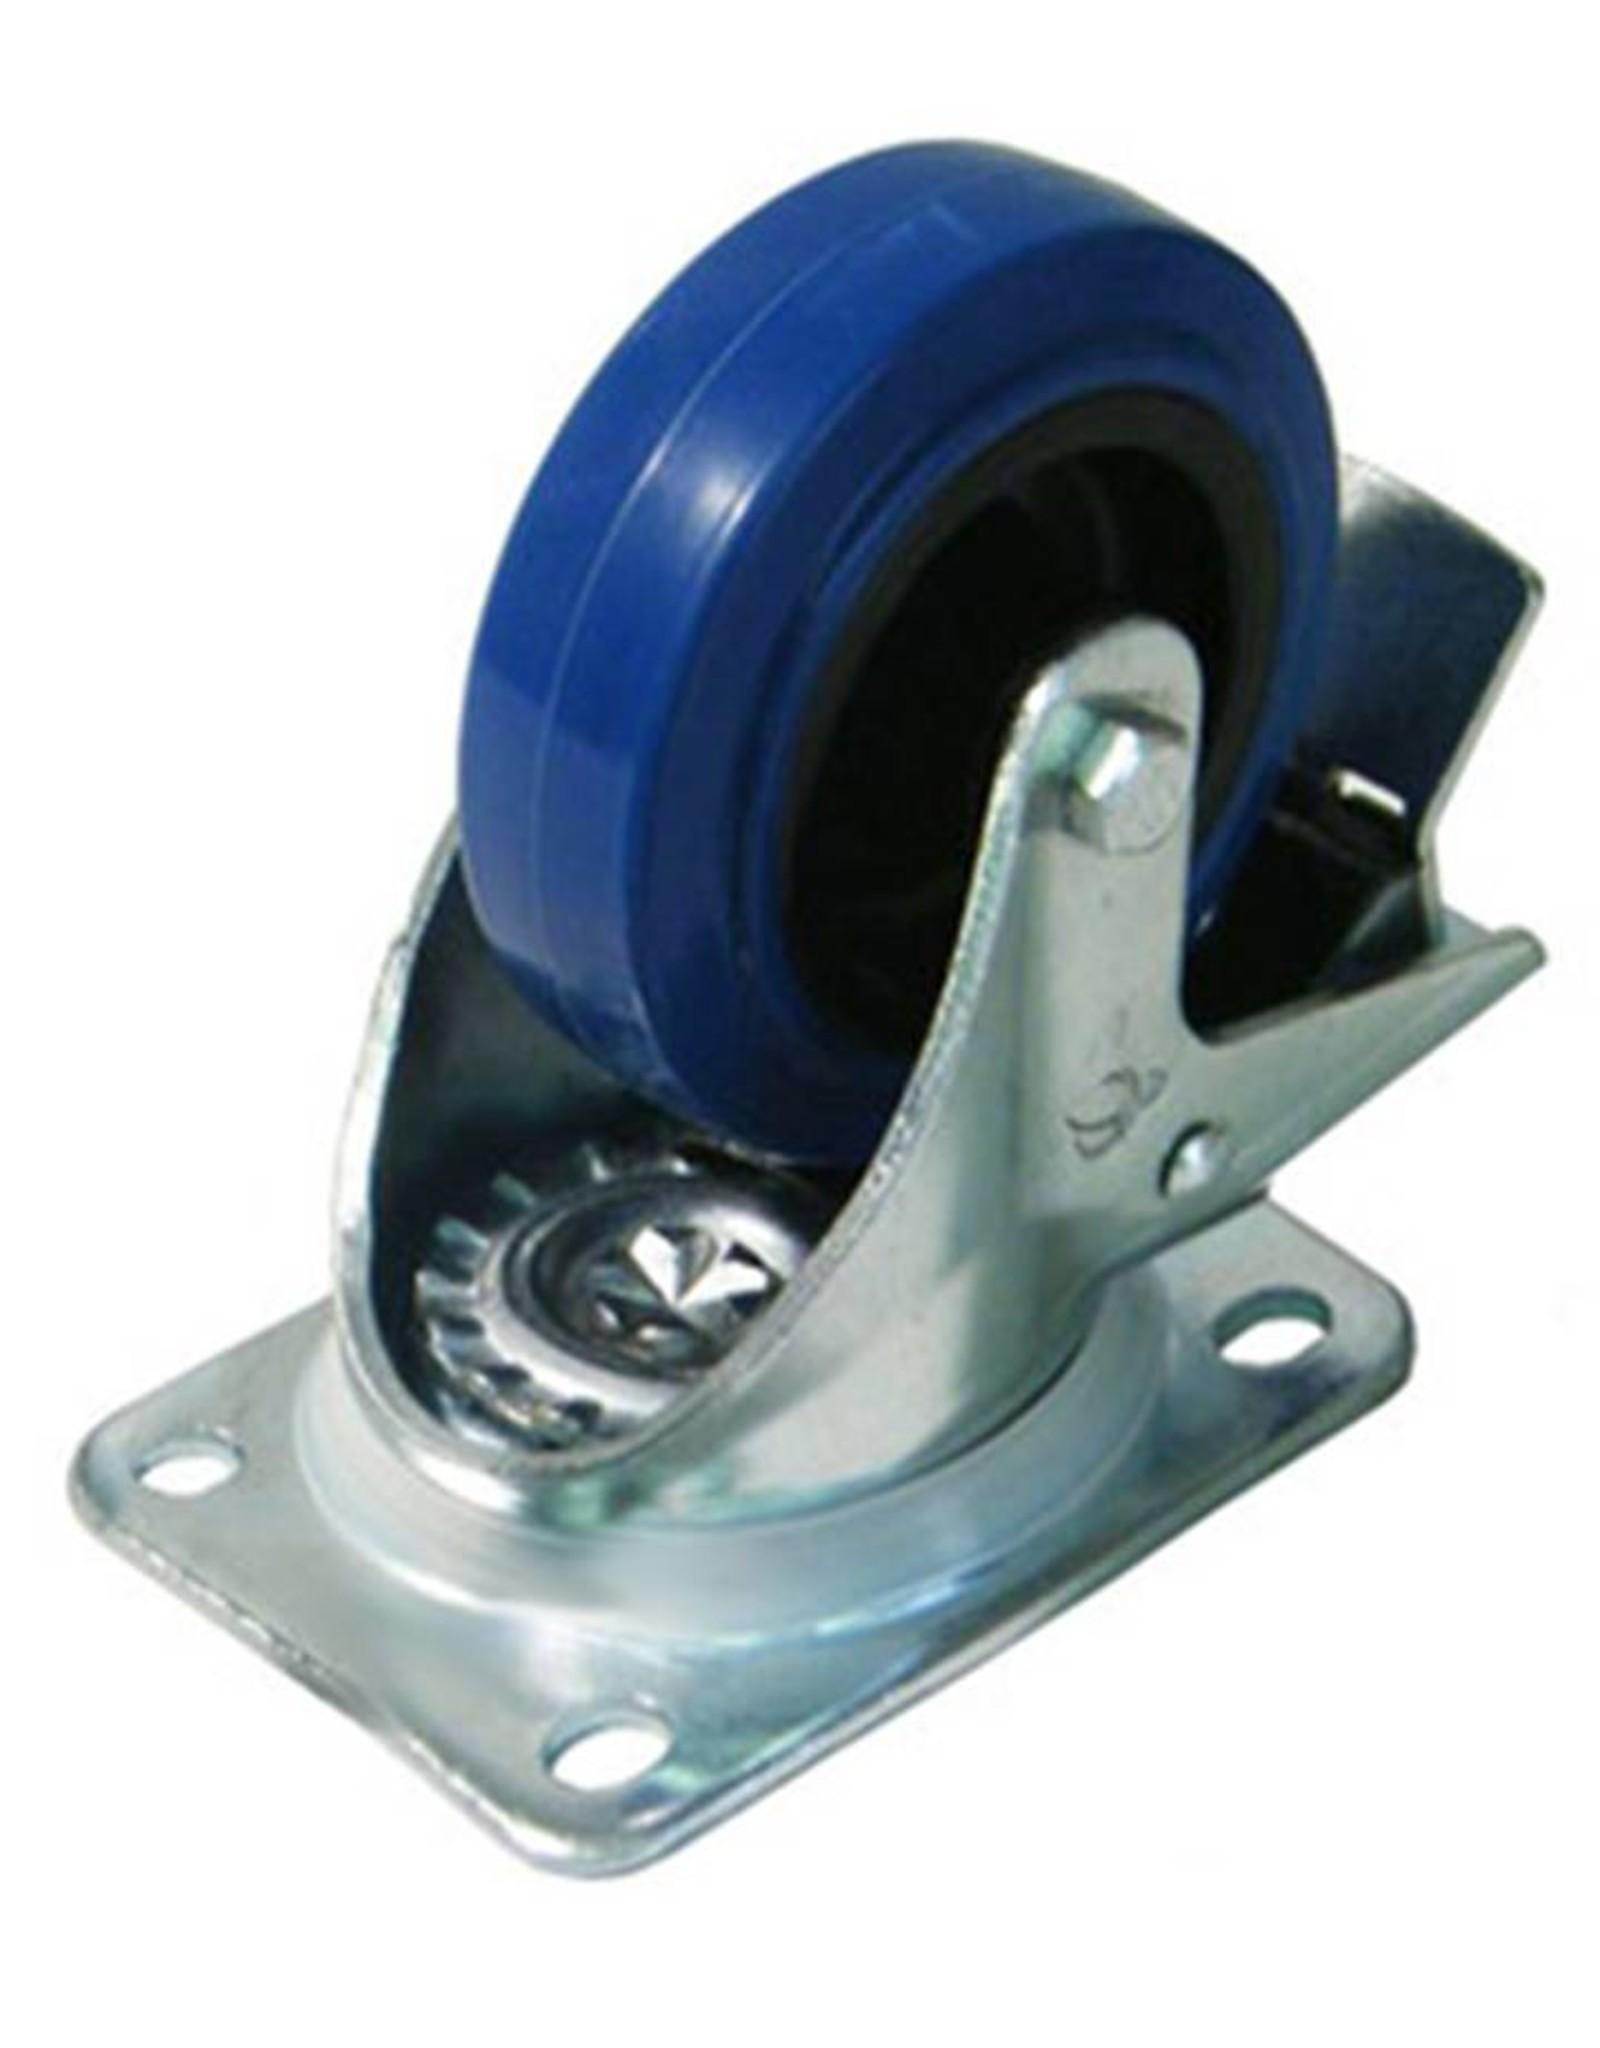 Penn Elcom Penn Elcom W0985/80 zwenkwiel + rem 80 mm, blauw